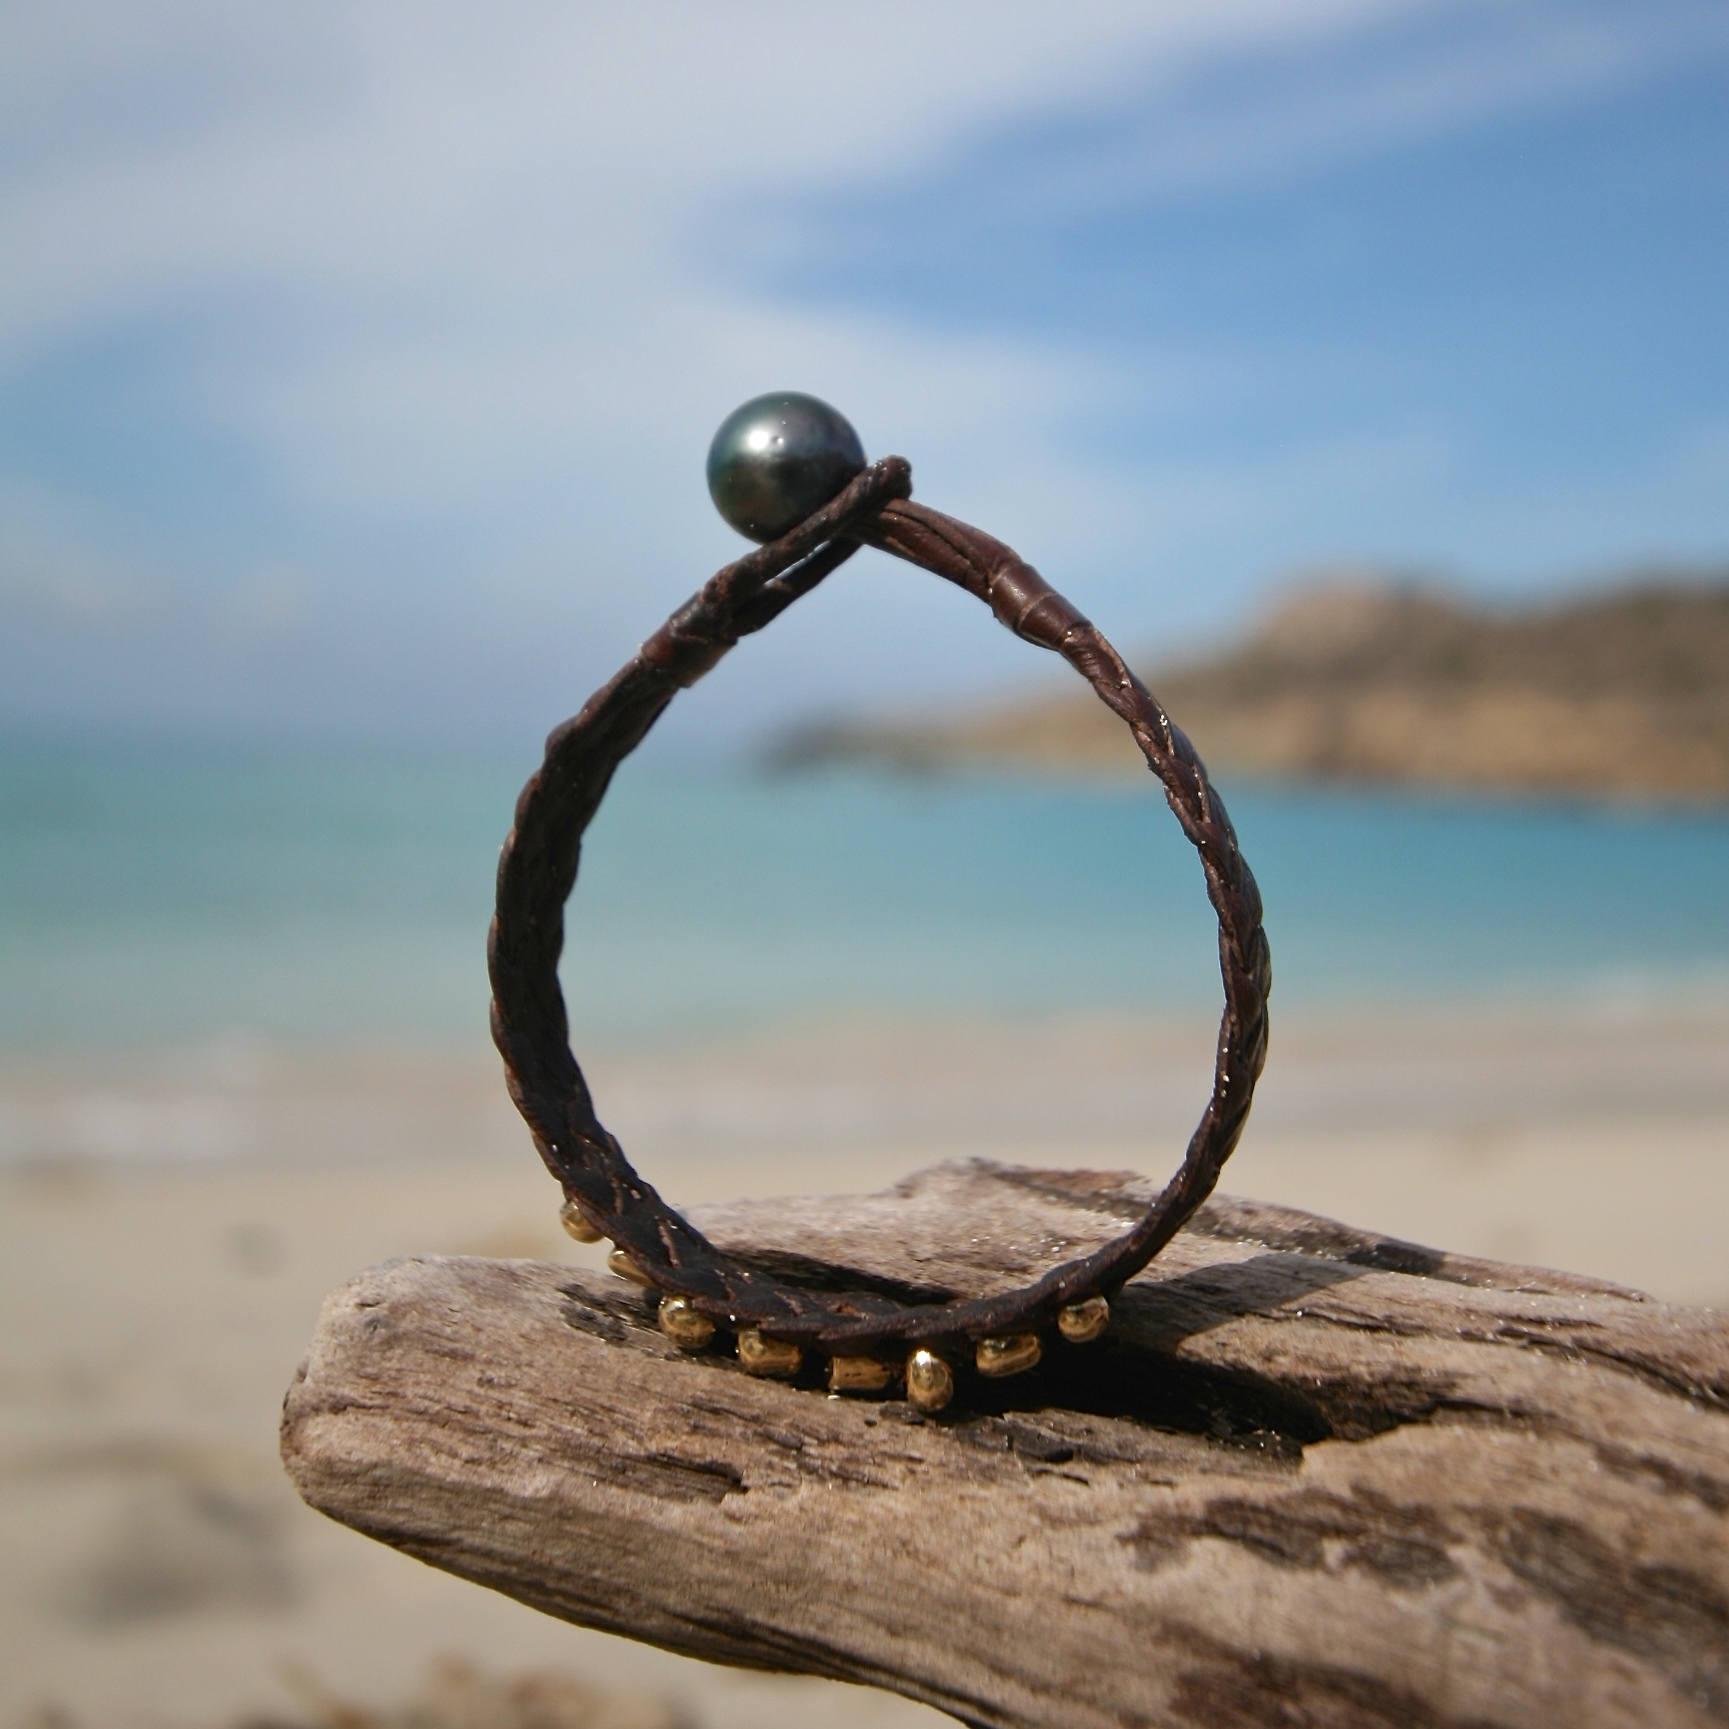 st barth jewelry leather mens bracelet